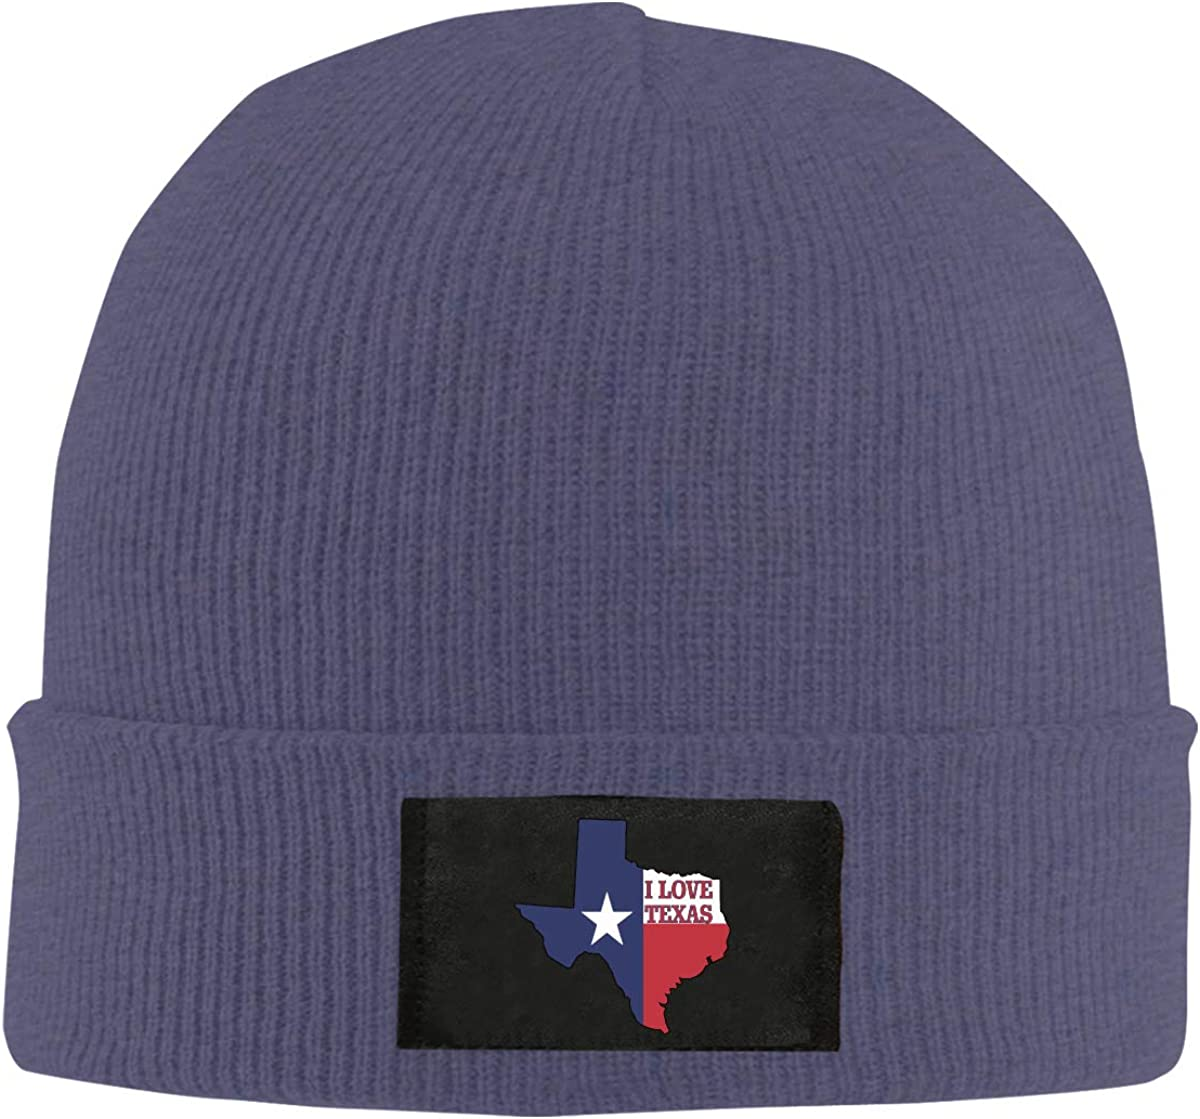 100/% Acrylic Winter Skiing Cap Mens and Womens I Love Texas Texan Flag Knit Cap